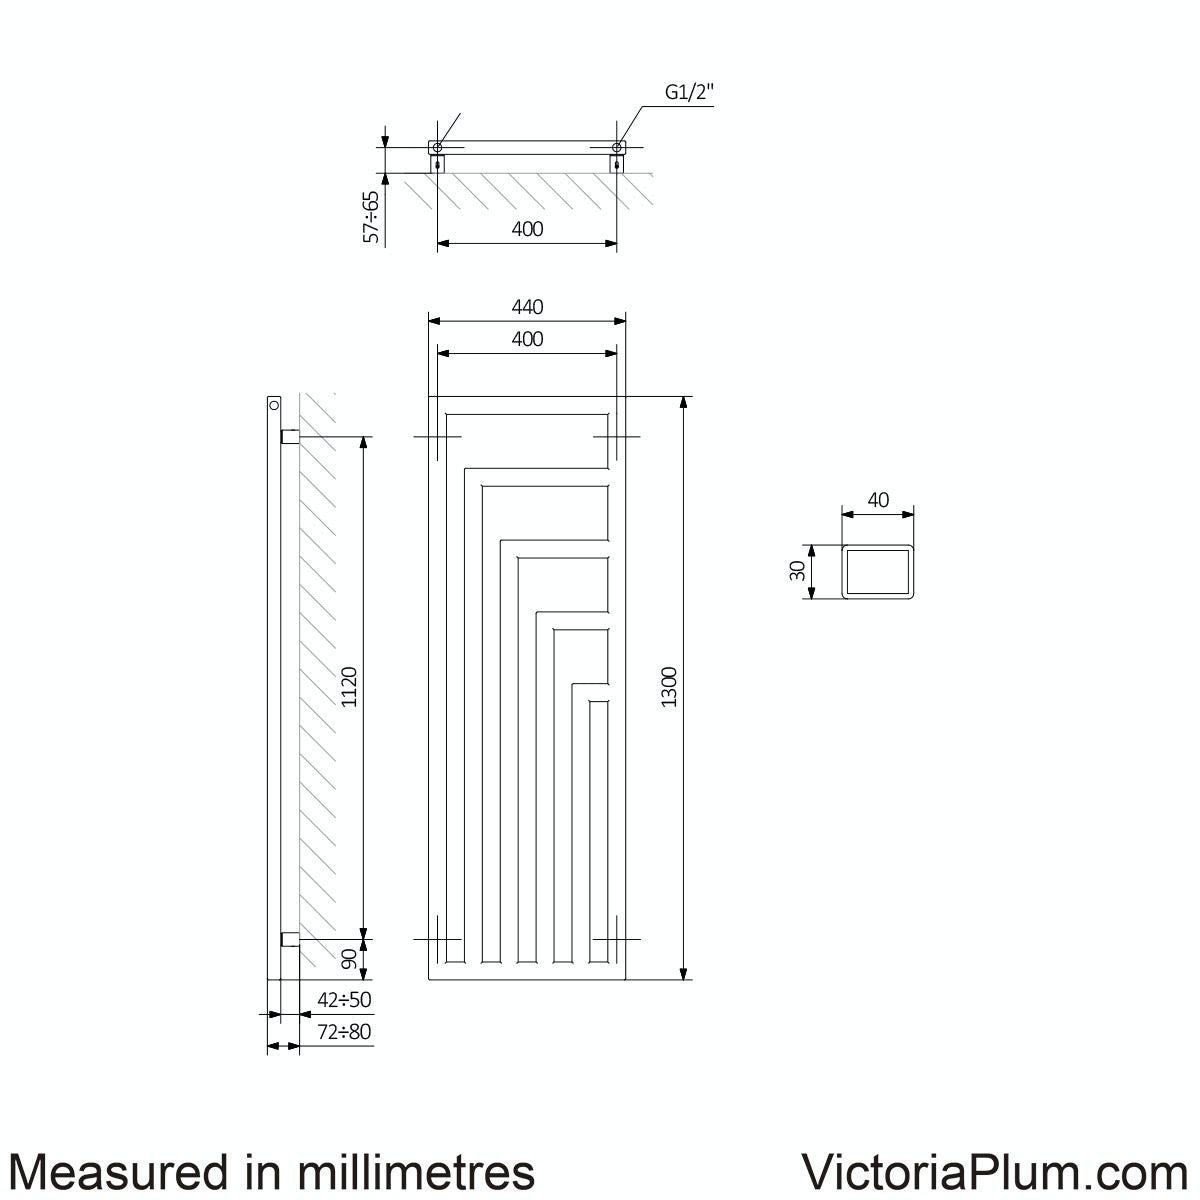 Dimensions for Terma Angus modern grey radiator 1300 x 440